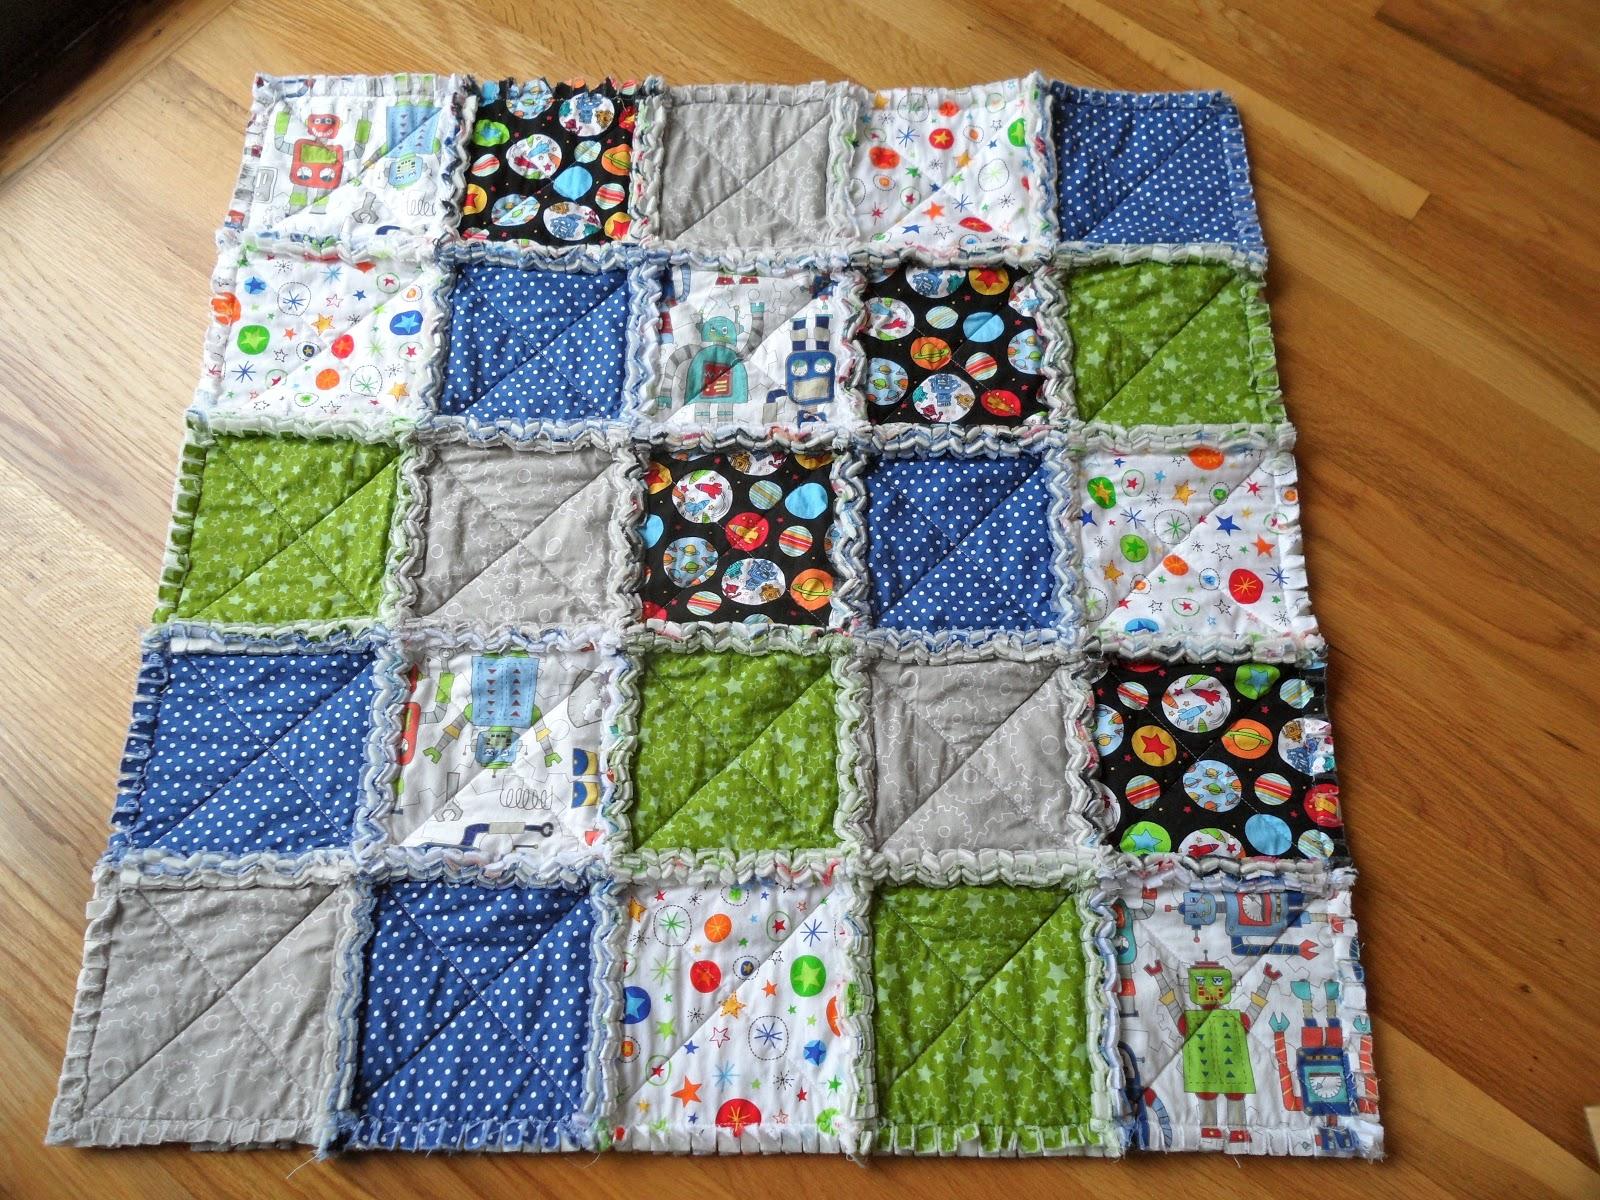 Life in the hempelmann house rag quilt for Robot quilt fabric